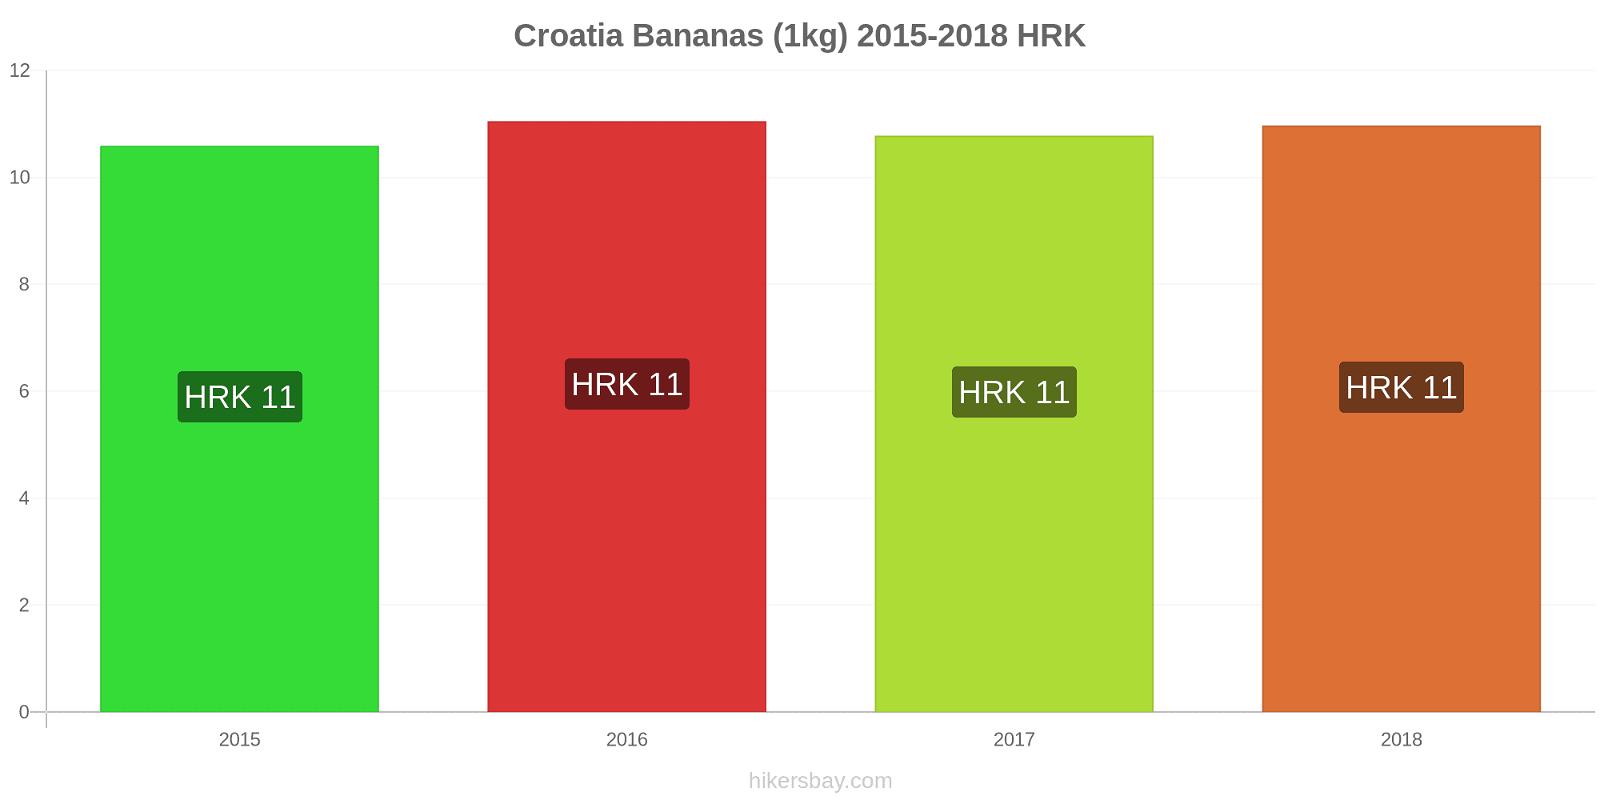 Croatia price changes Bananas (1kg) hikersbay.com